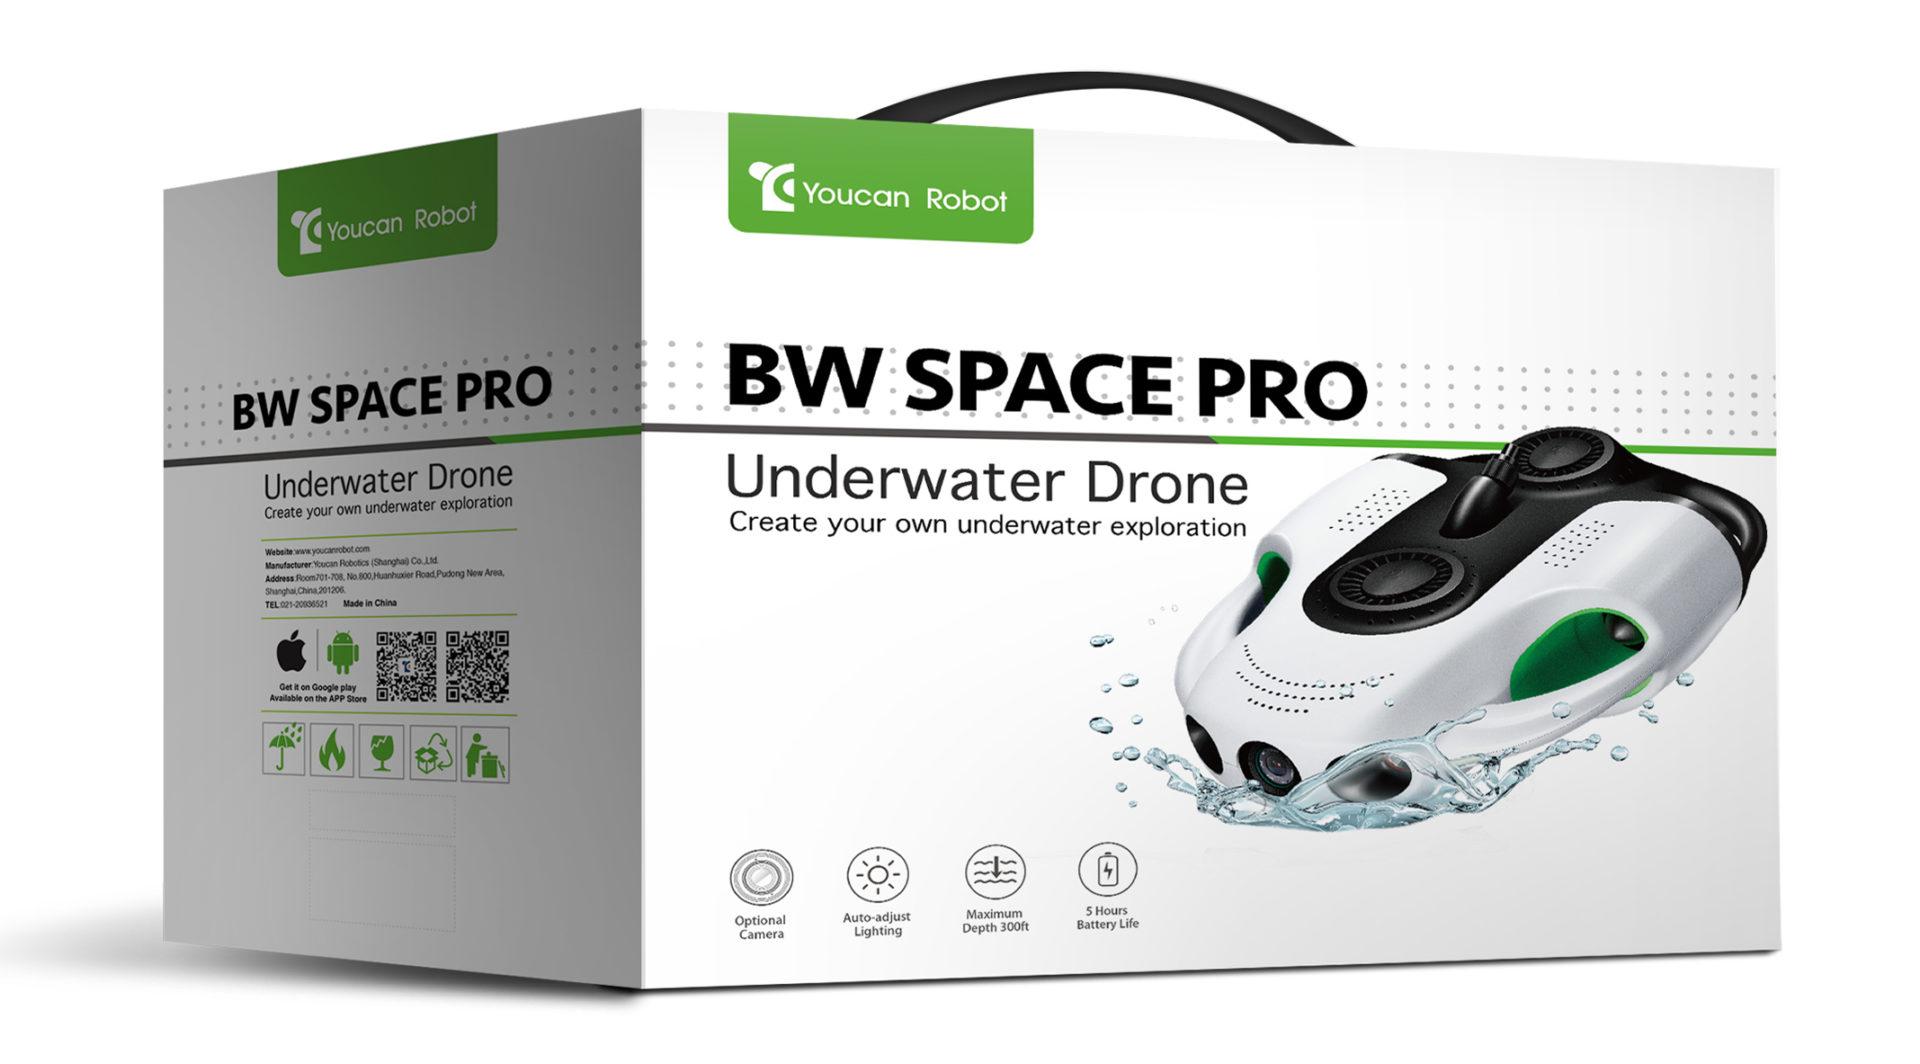 BW Space Pro 4Kモデル、パッケージ